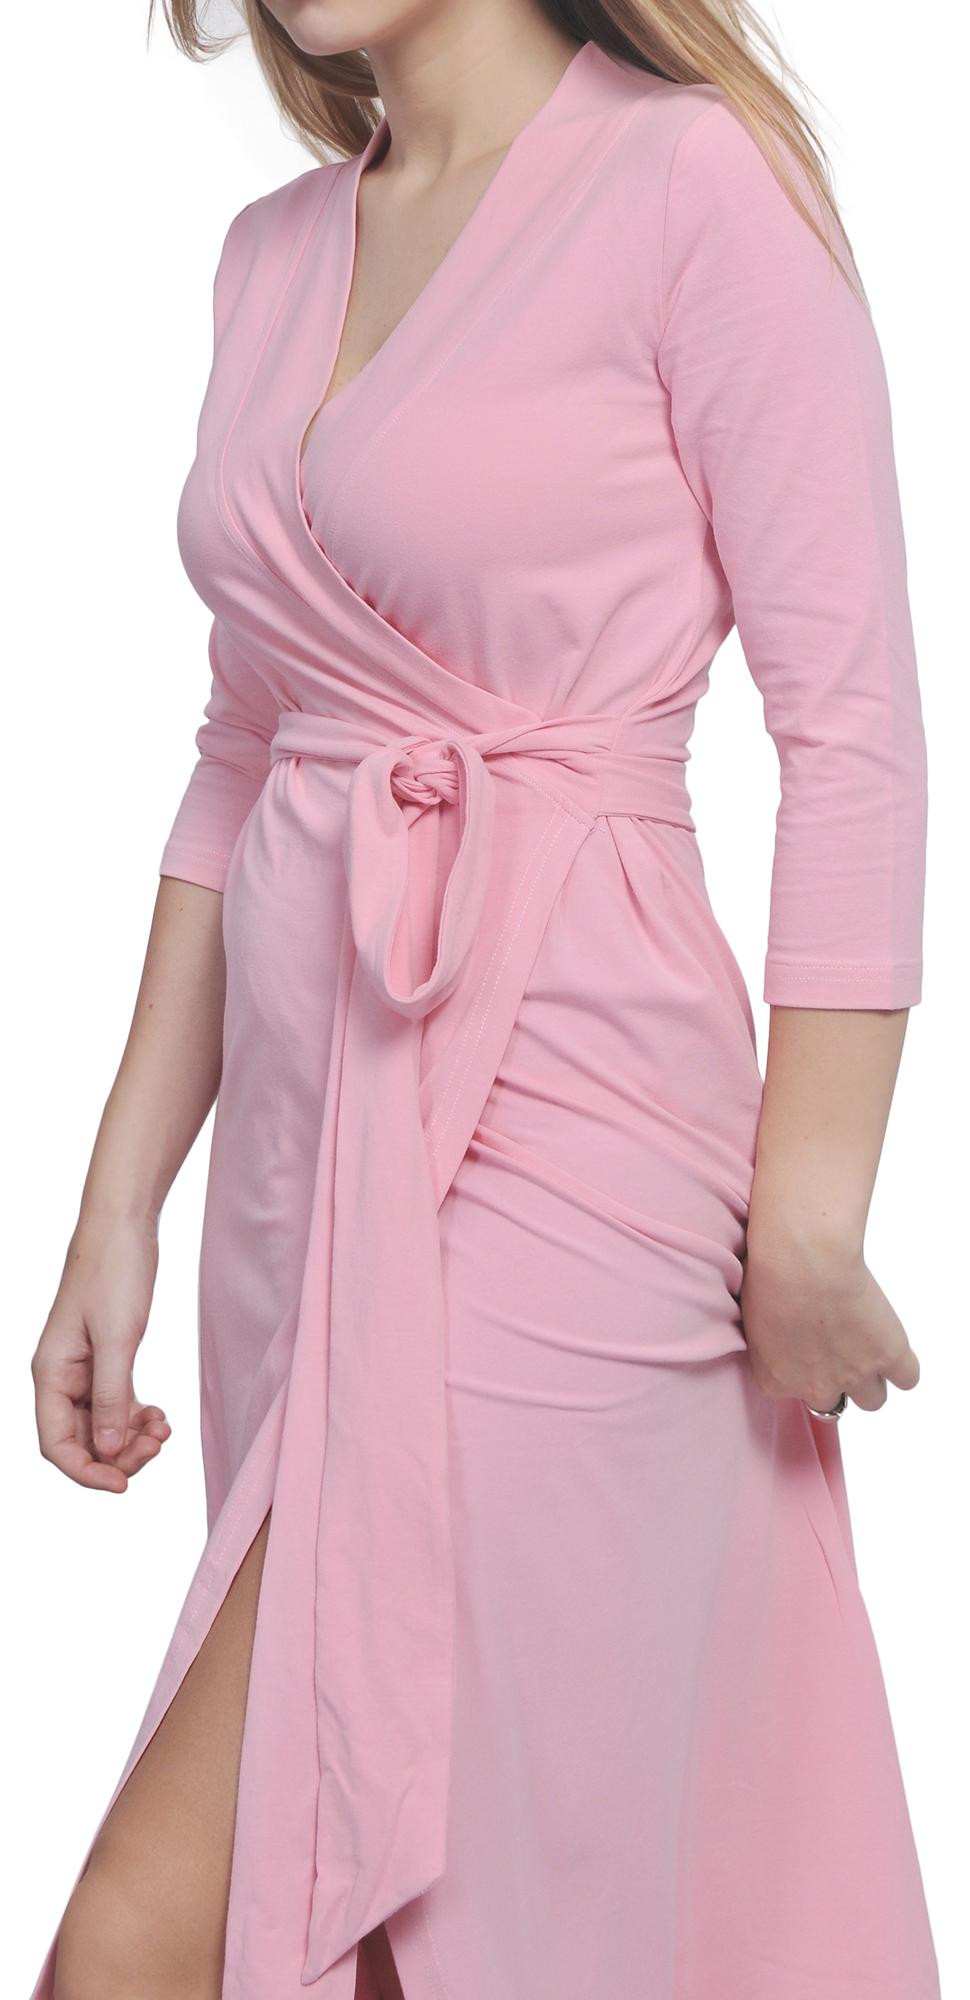 MAXI FULL LENGTH WRAP DRESS LONG SLEEVE CROSSOVER DRESSES CASUAL ...